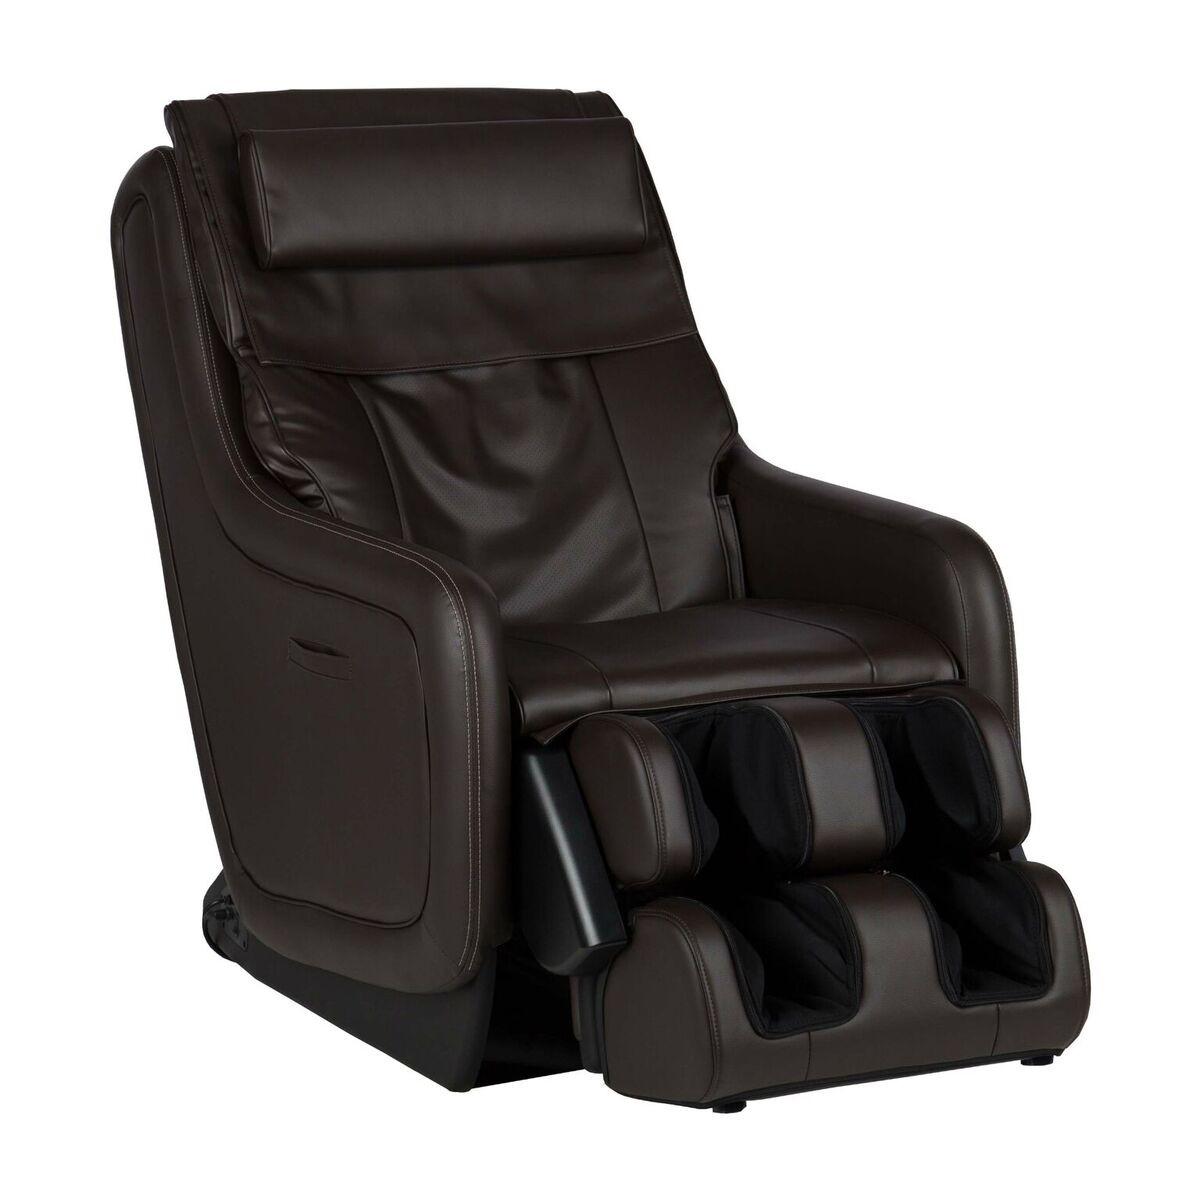 Fauteuil de massage AT 650 ZeroG 3